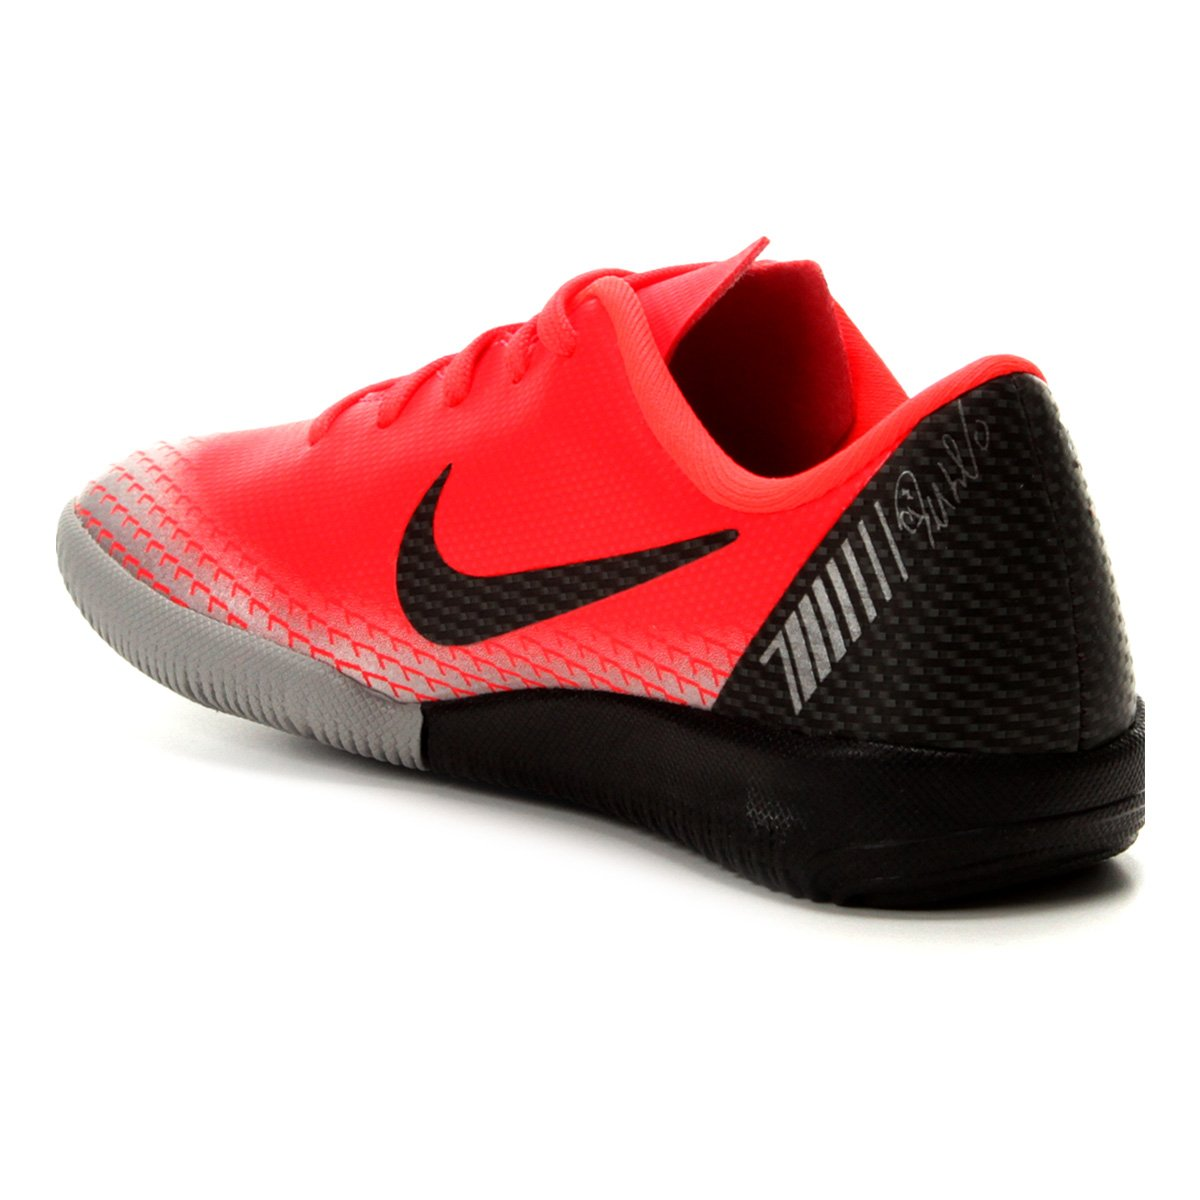 Chuteira Futsal Infantil Nike Vapor 12 Academy OS CR7 IC - Vermelho ... 1f5ab3581239f